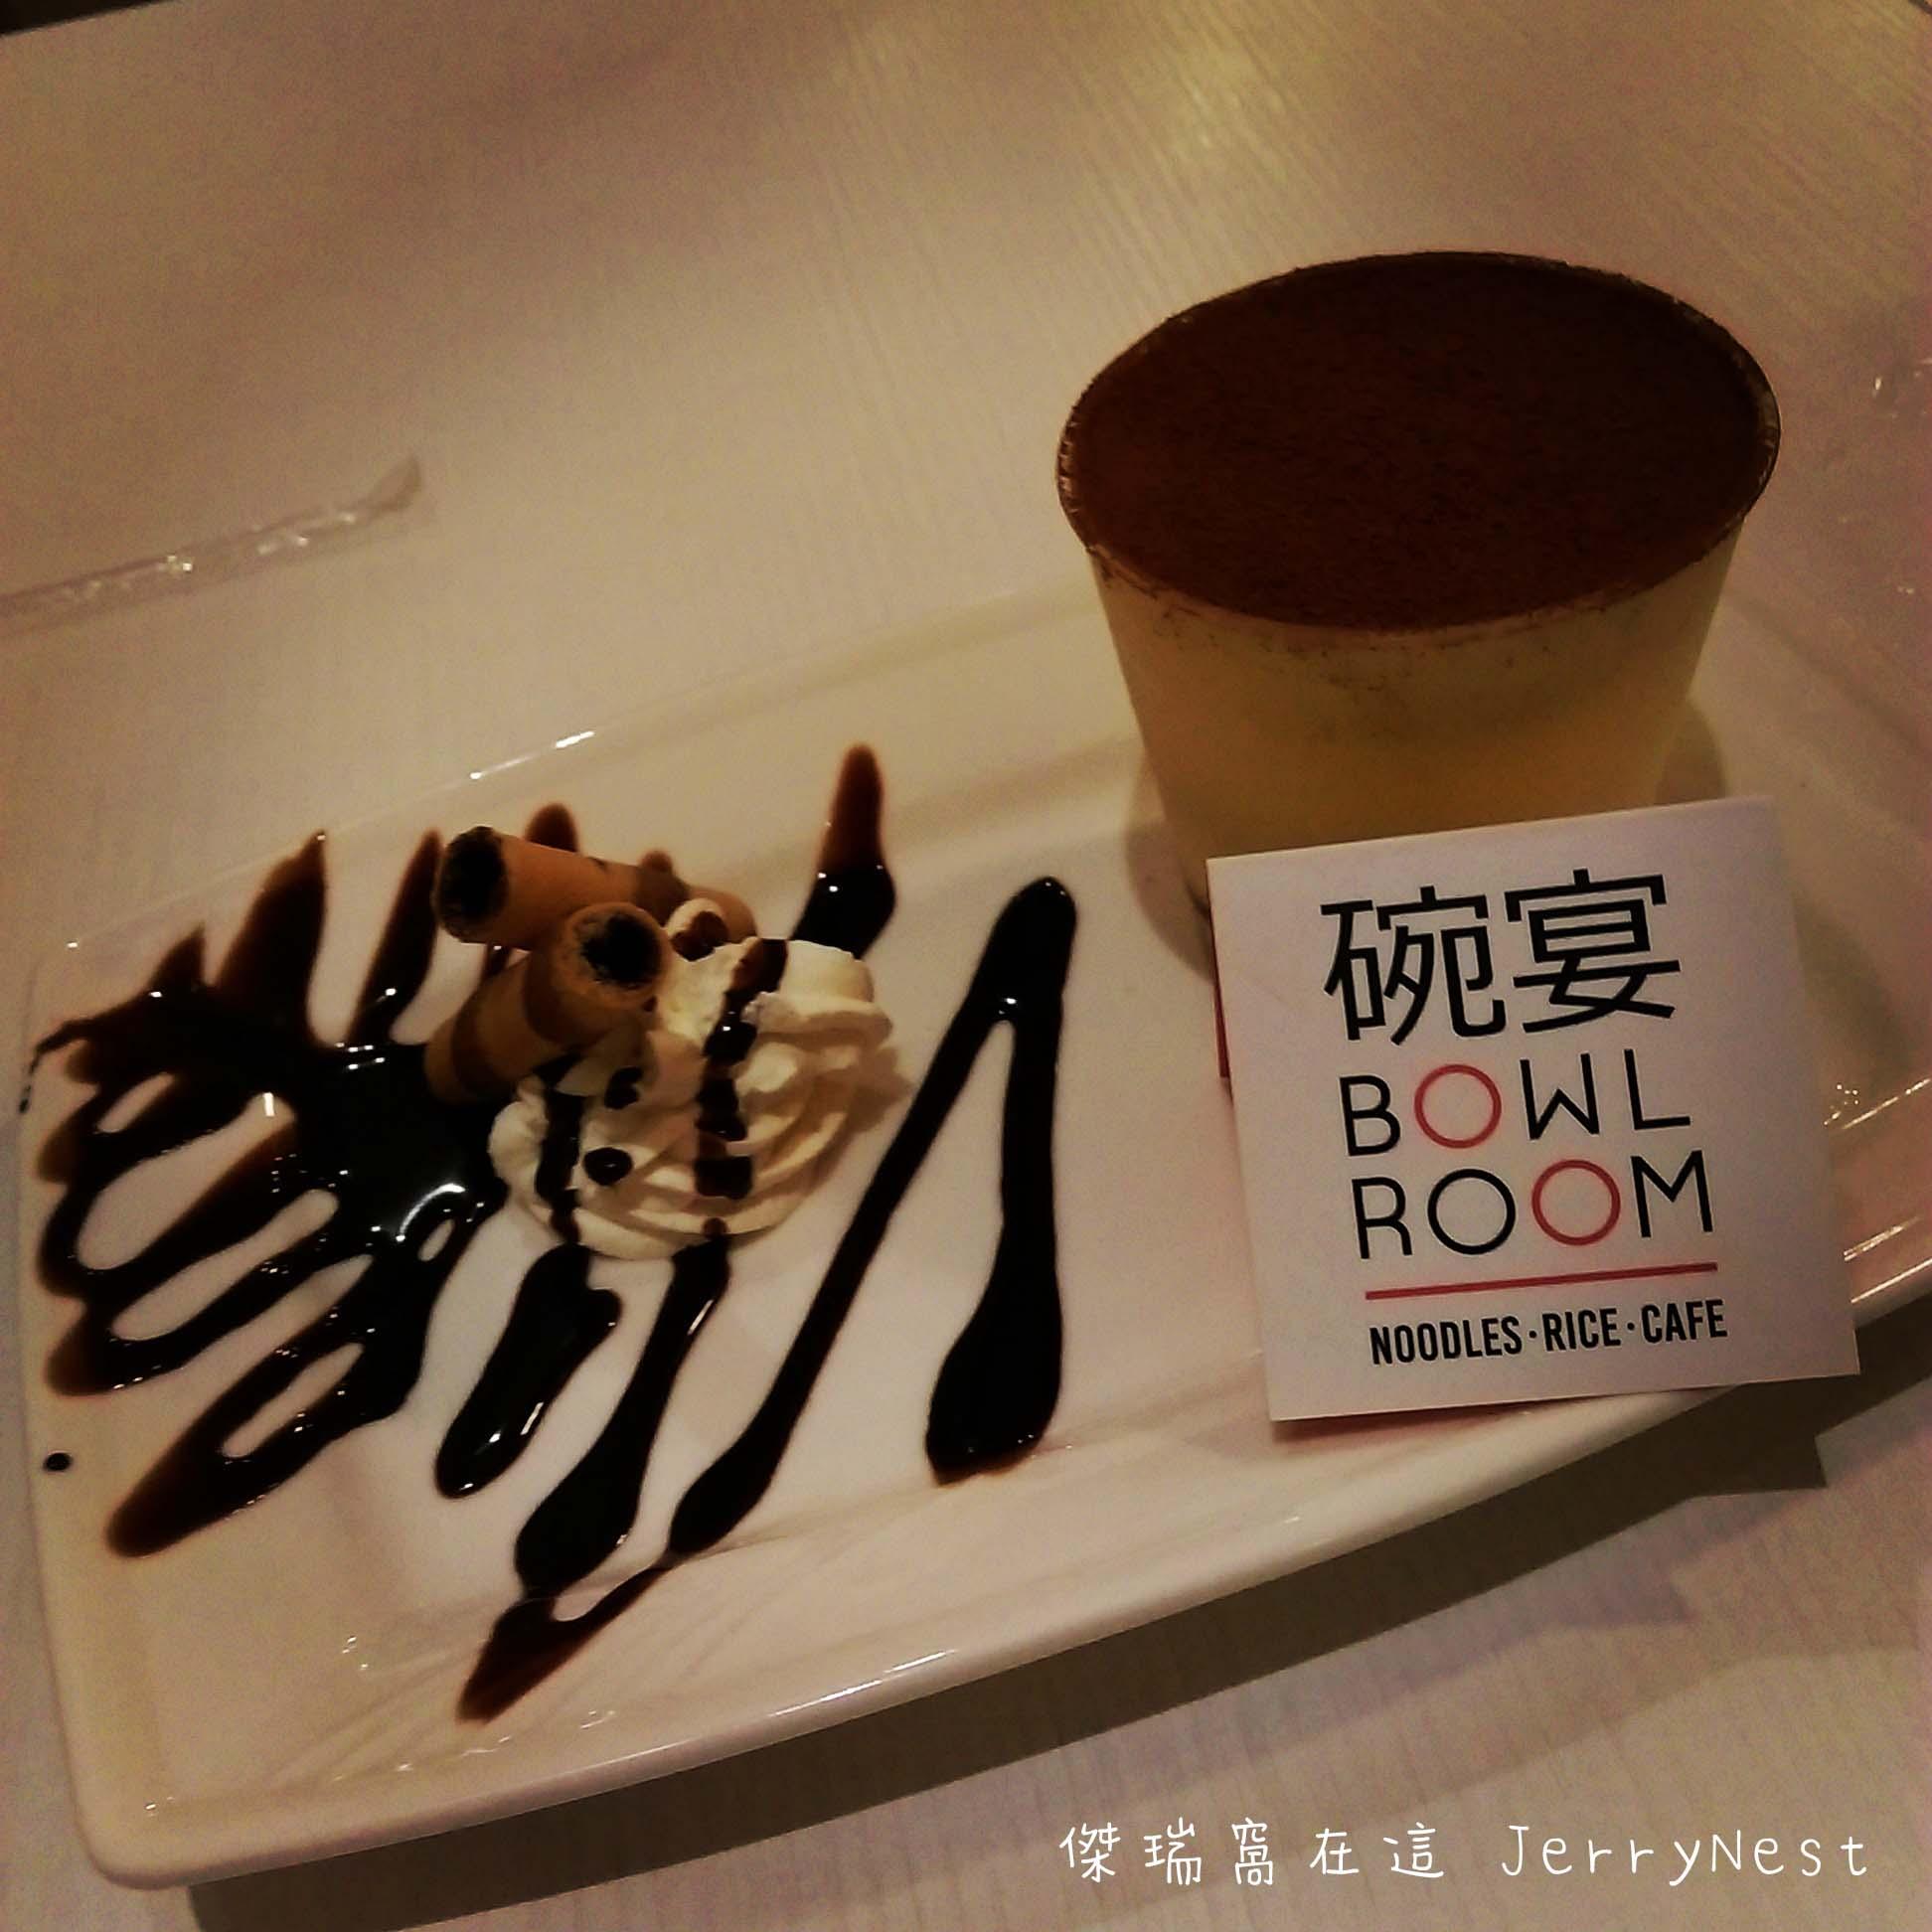 bb1 - 台北微風廣場|用碗喝飲料的亞洲特色餐廳 碗宴 Bowl Room